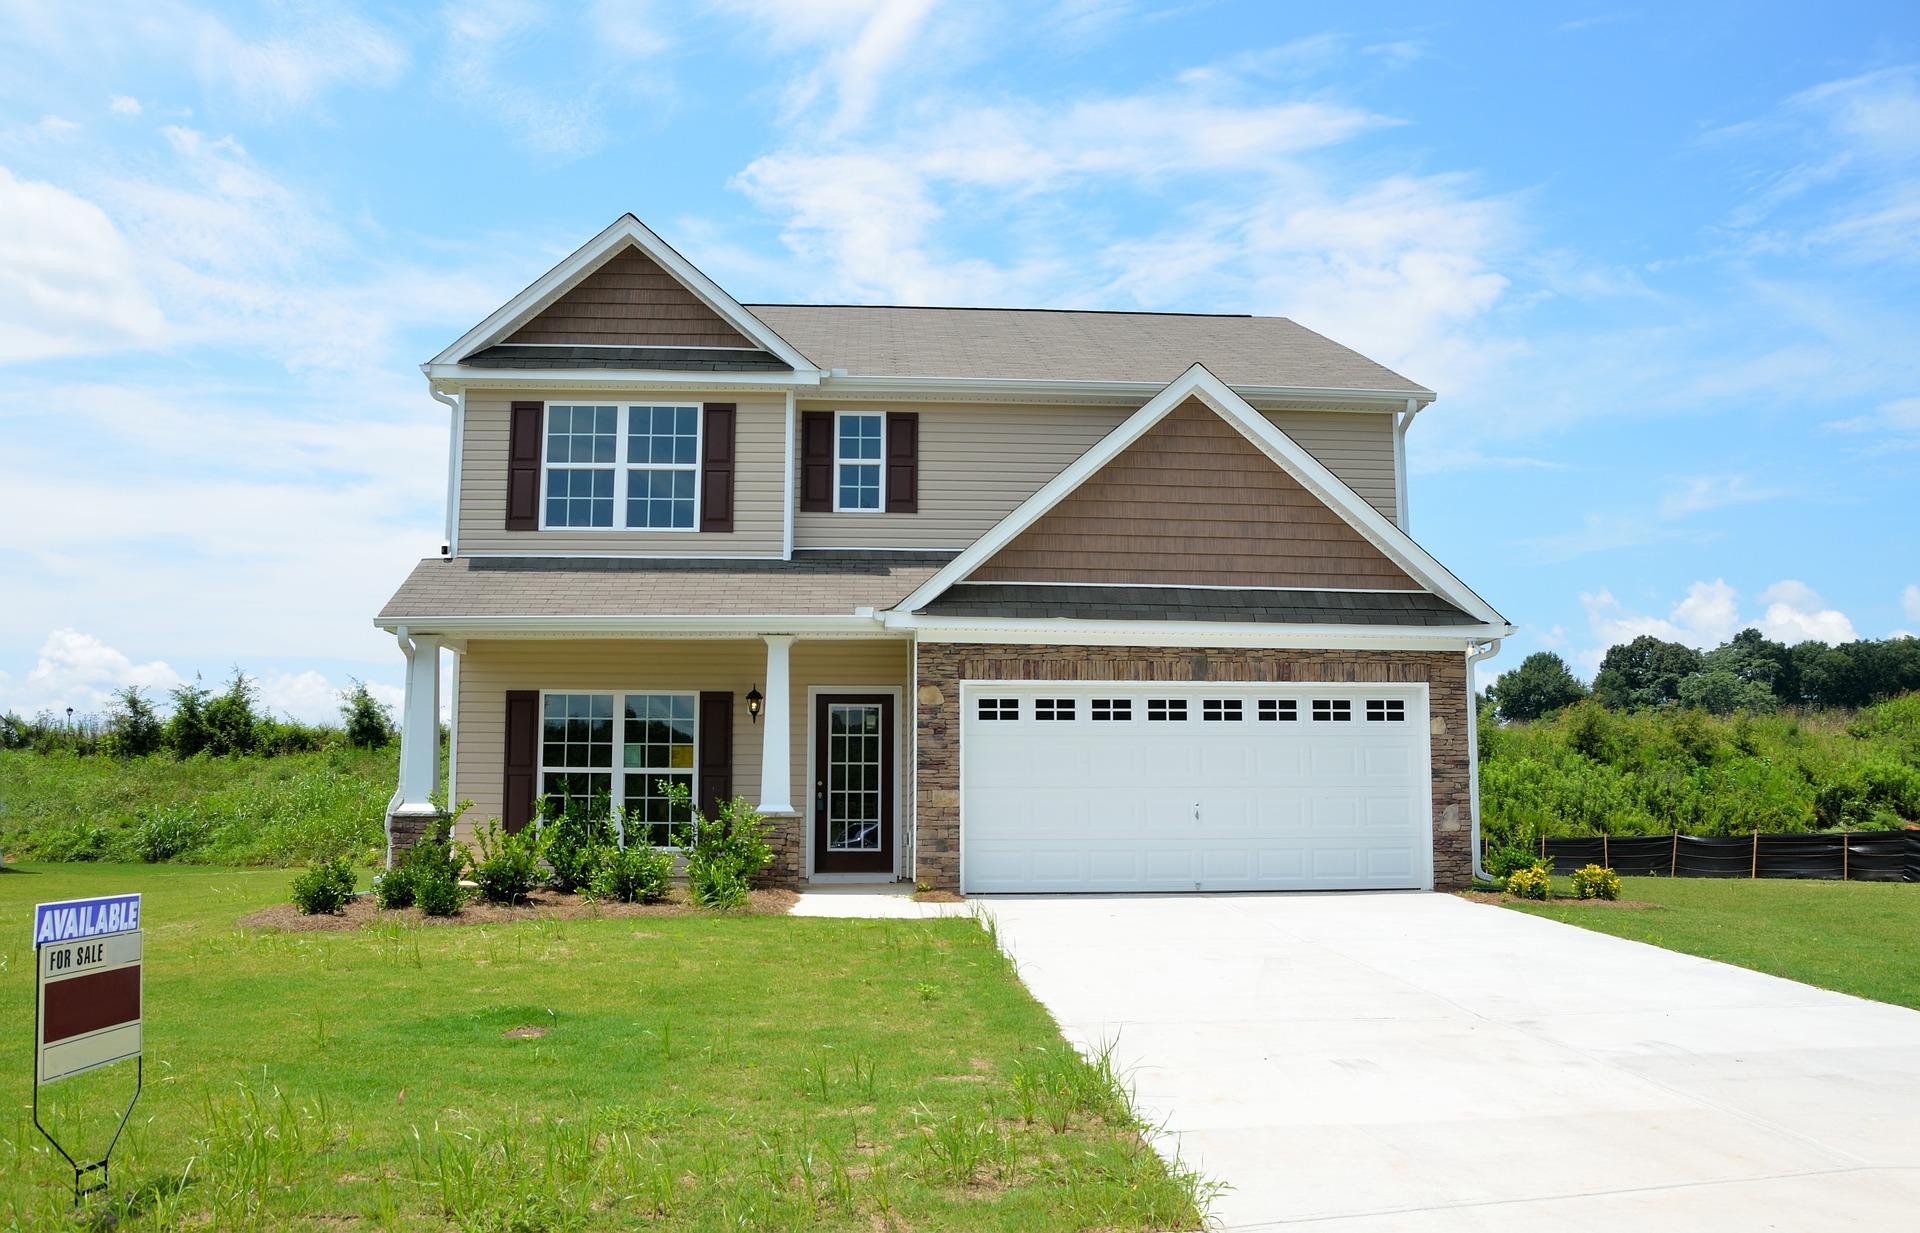 Whatu0027s The Future Of Real Estate?